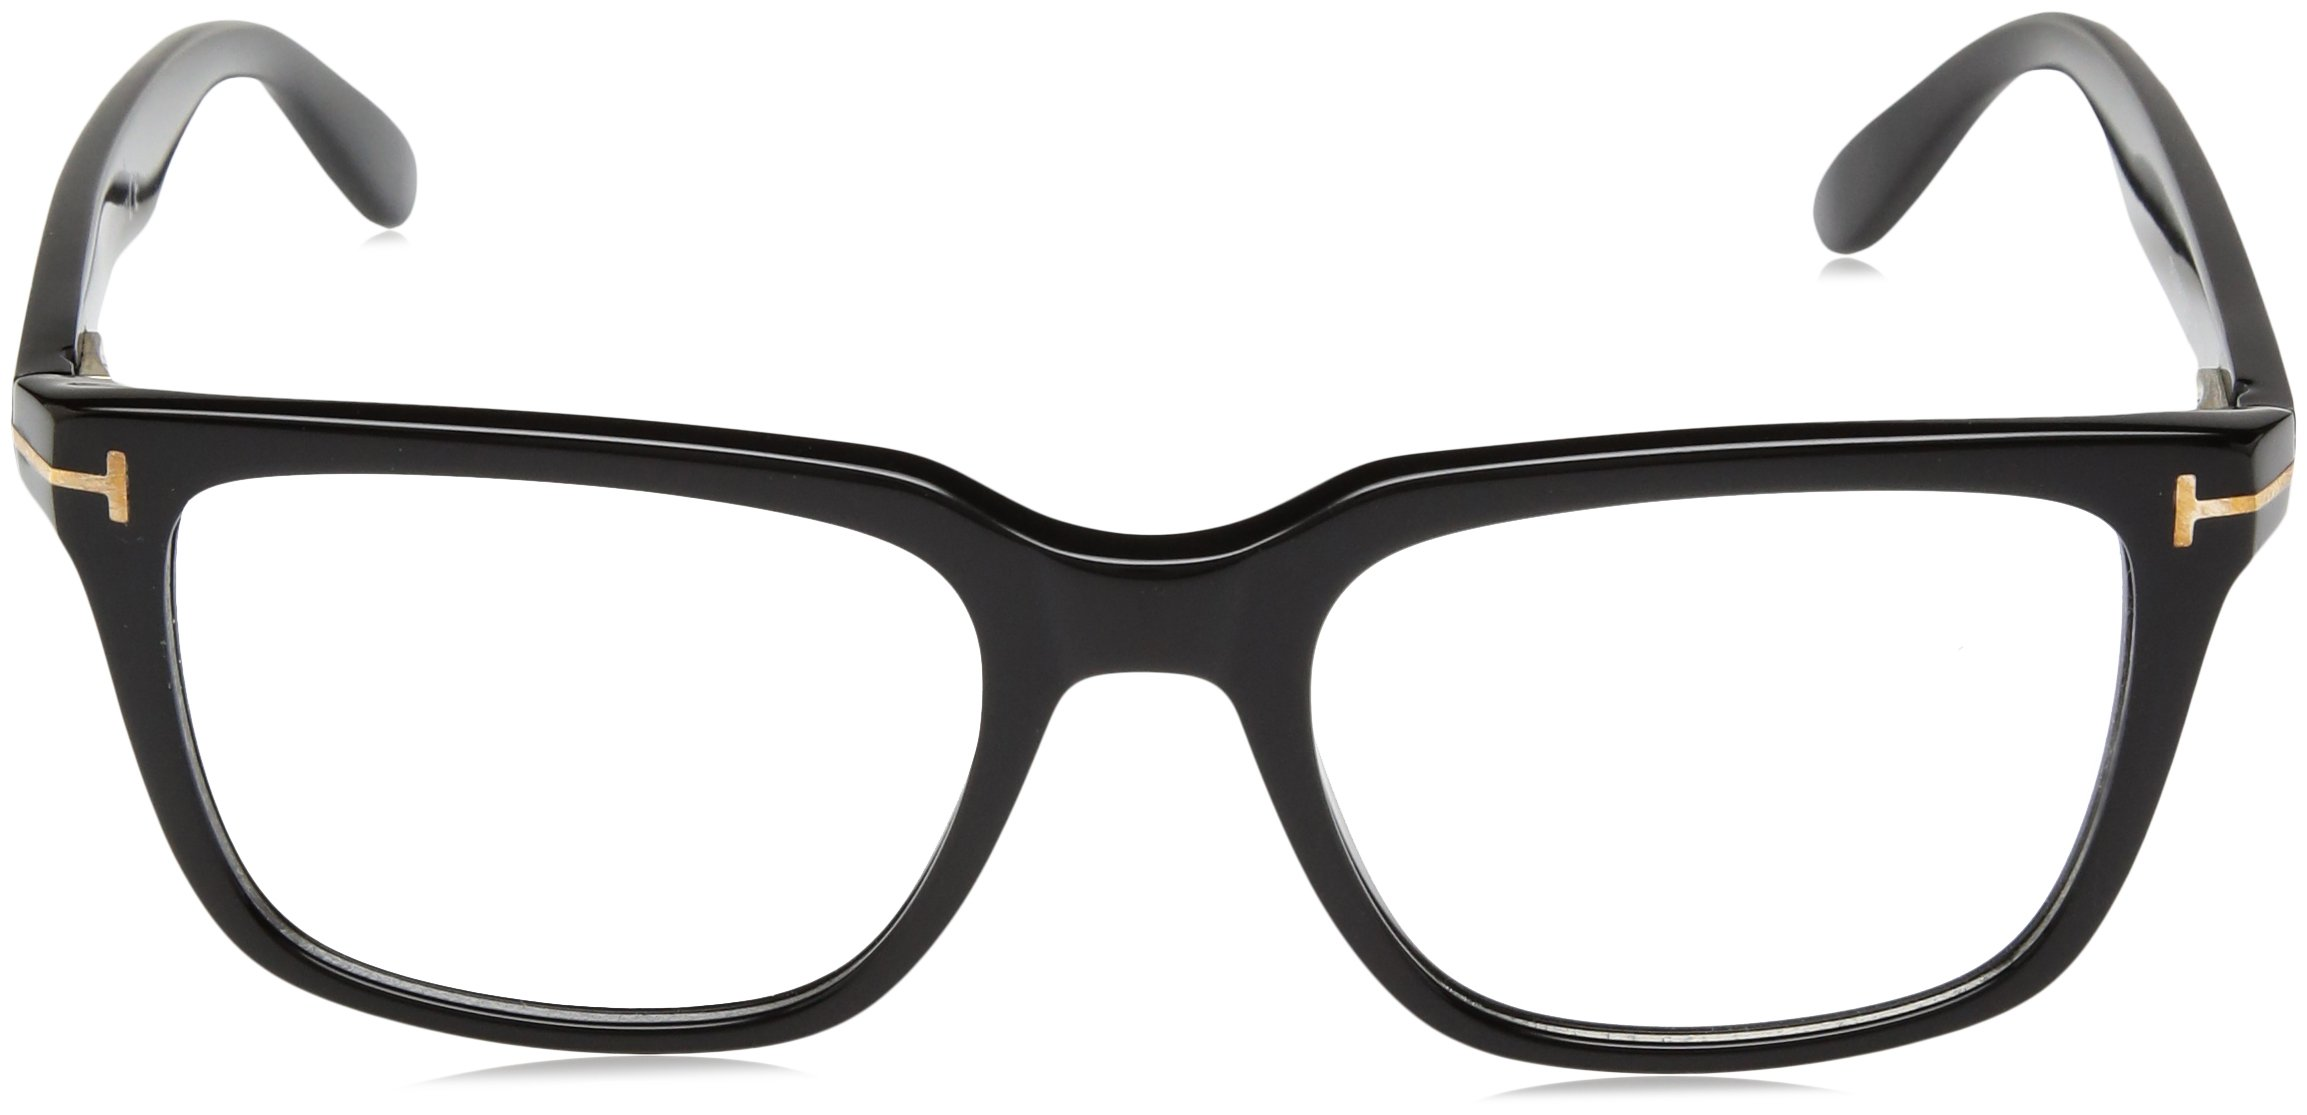 TOM Ford Eyeglasses Tf 5304 001 Shiny Black Tf5304-001-54mm by Tom Ford (Image #2)